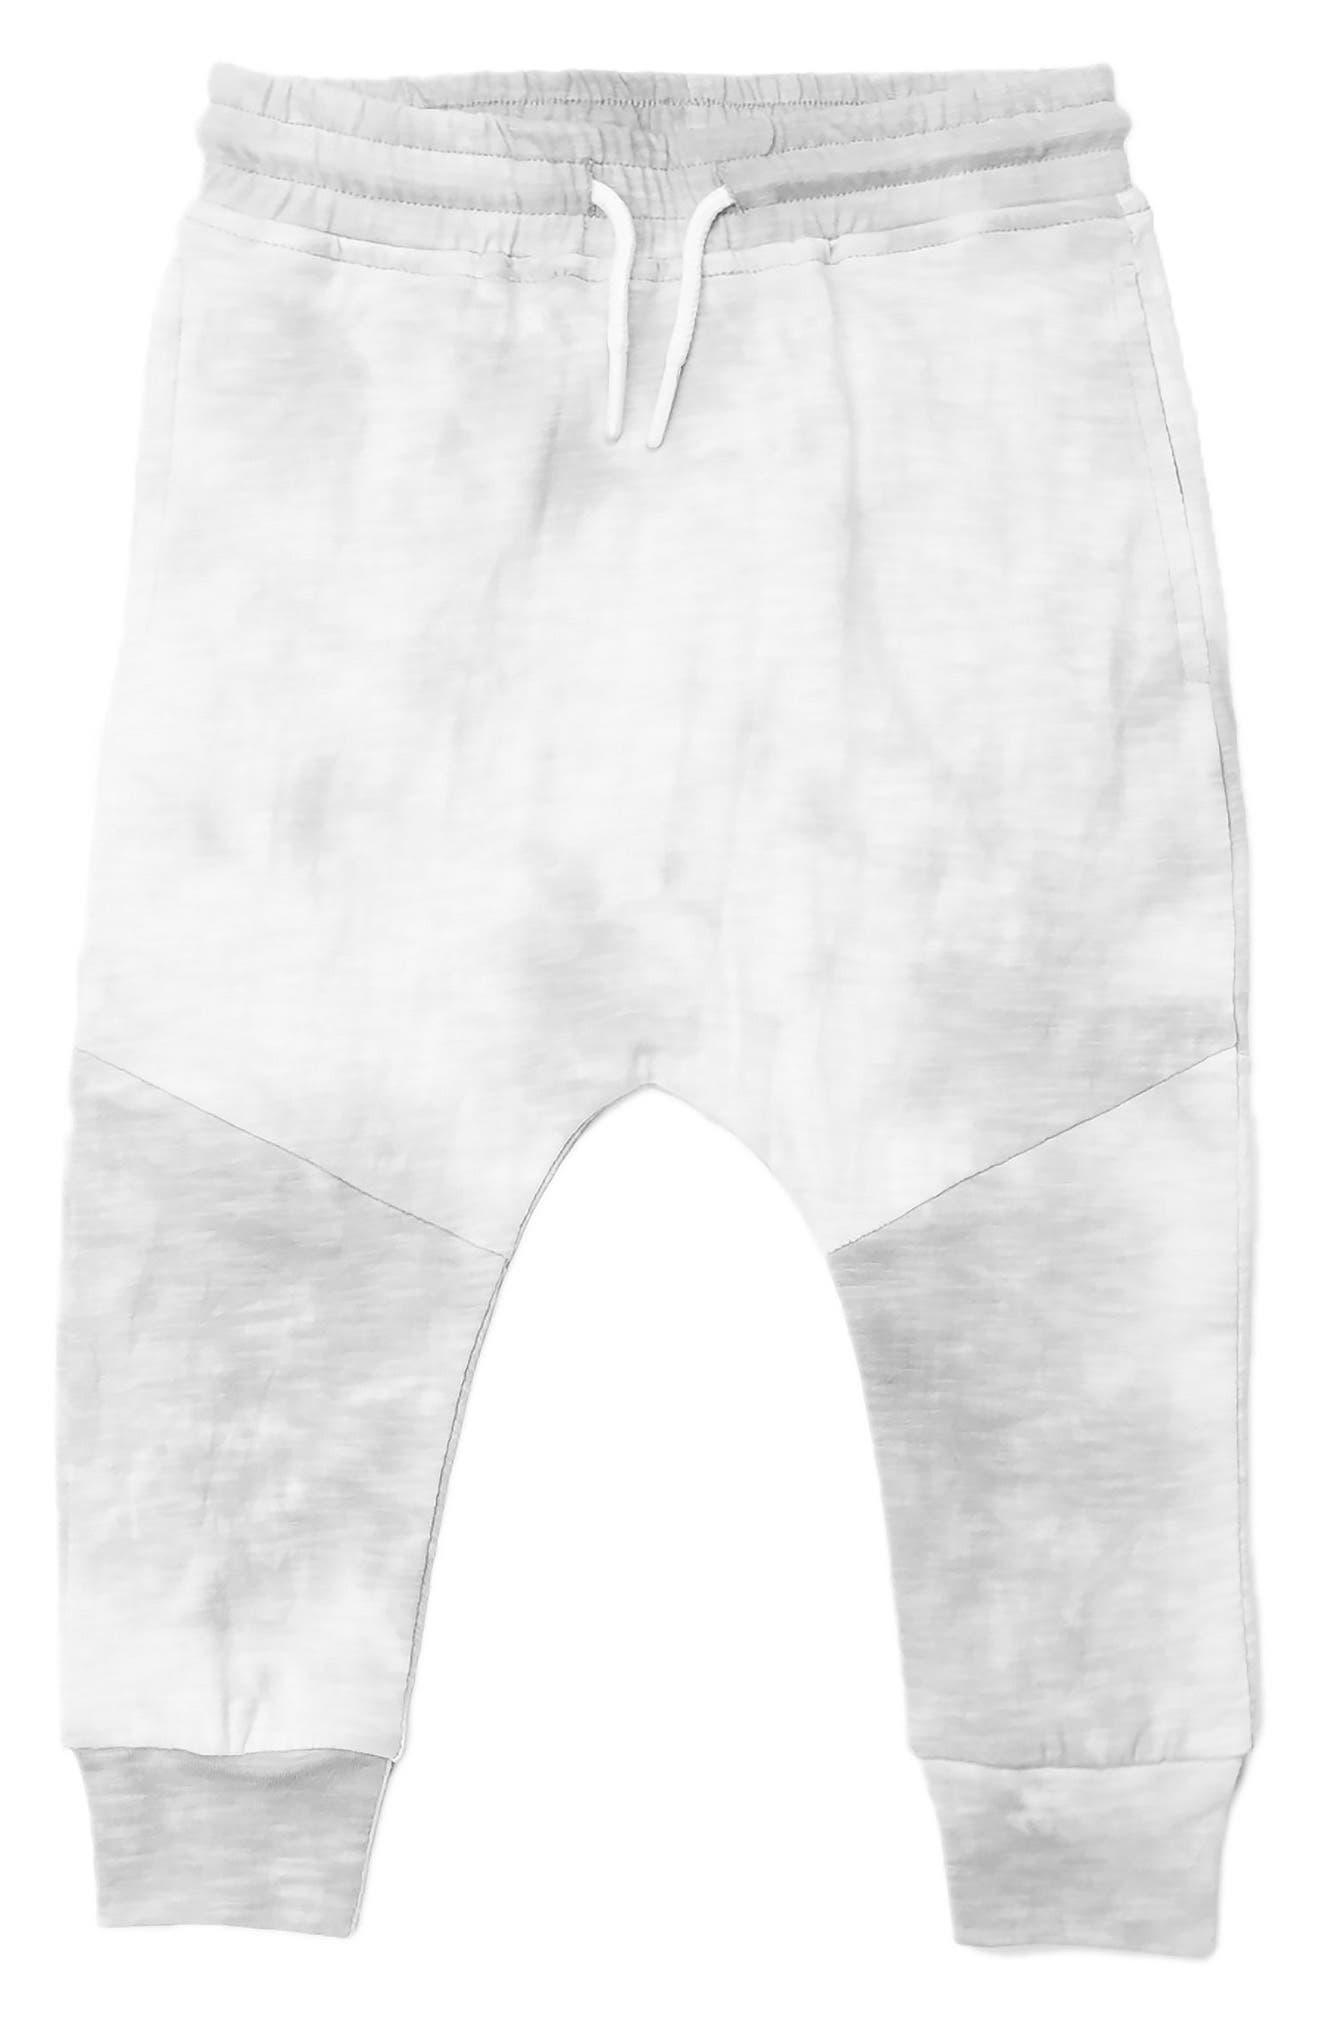 Ax Jogger Pants,                         Main,                         color, Grey